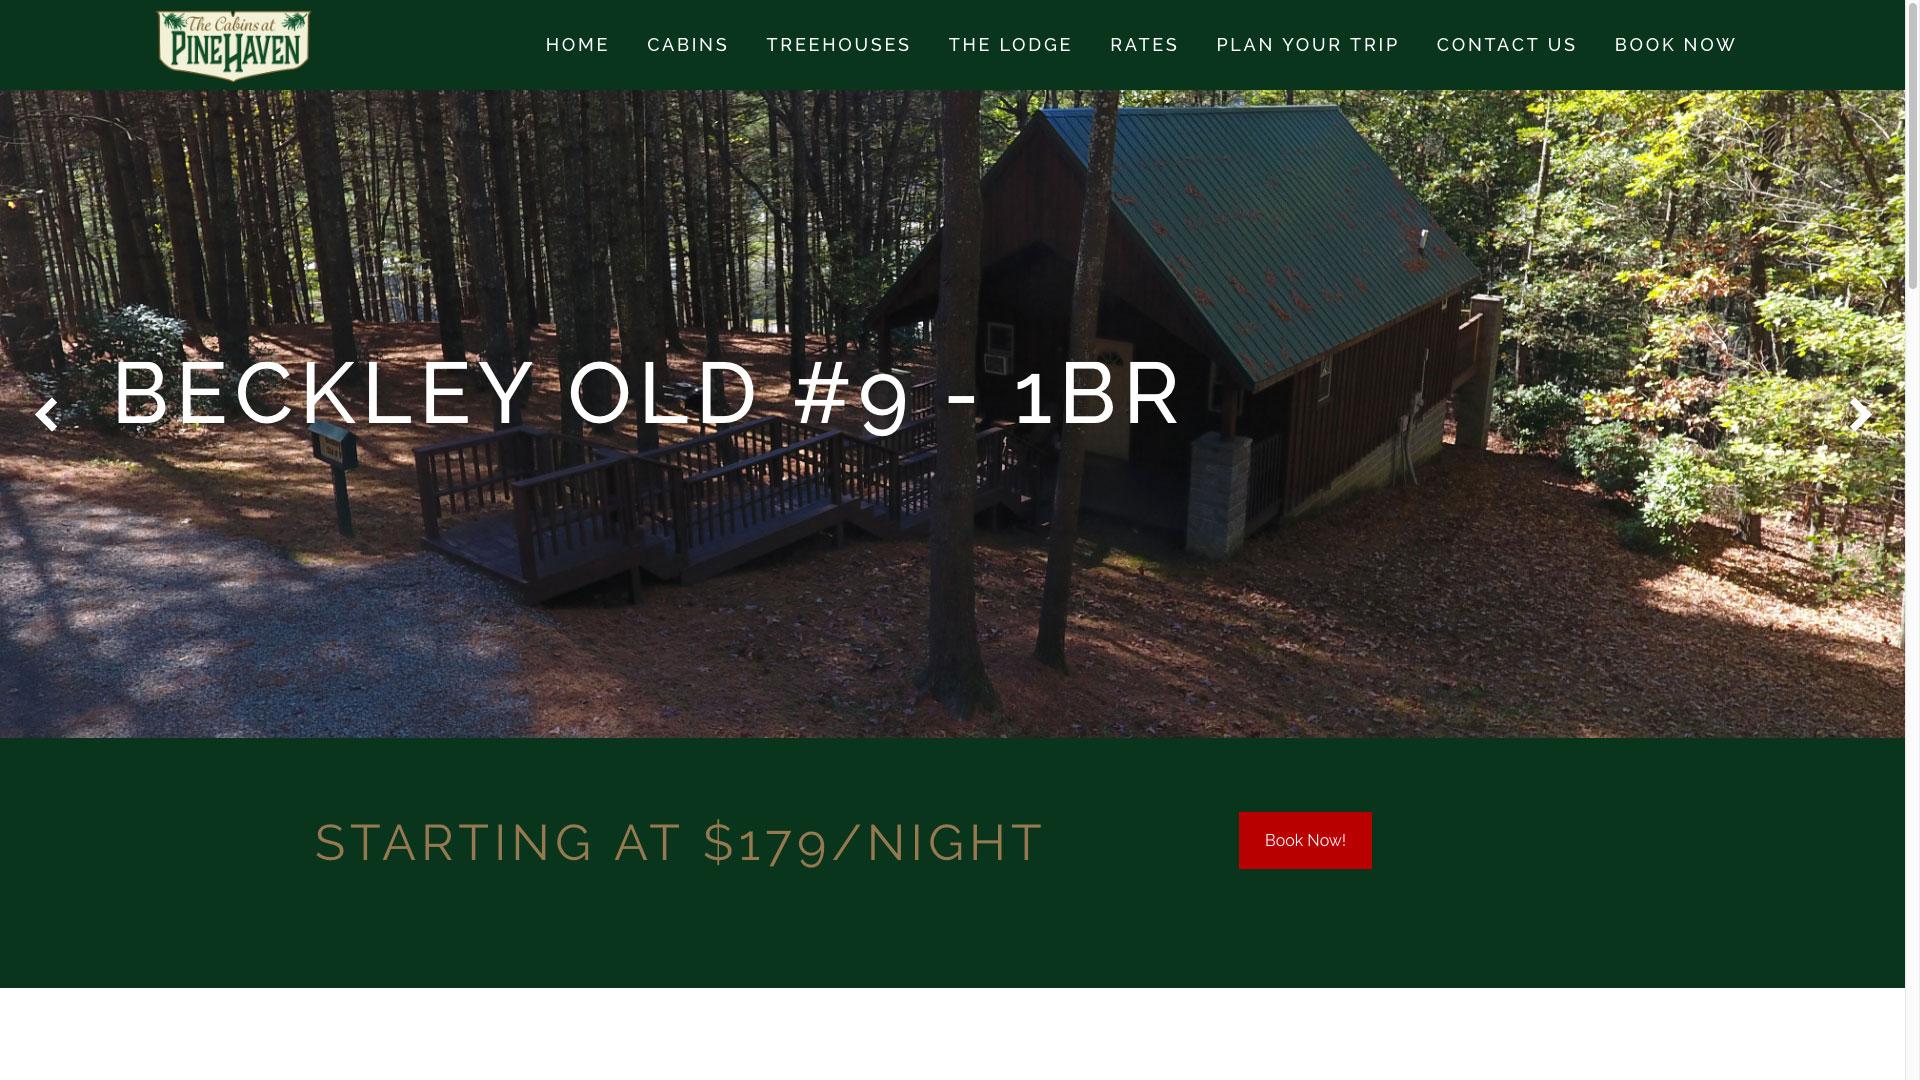 pinehaven-cabin-9-web-design